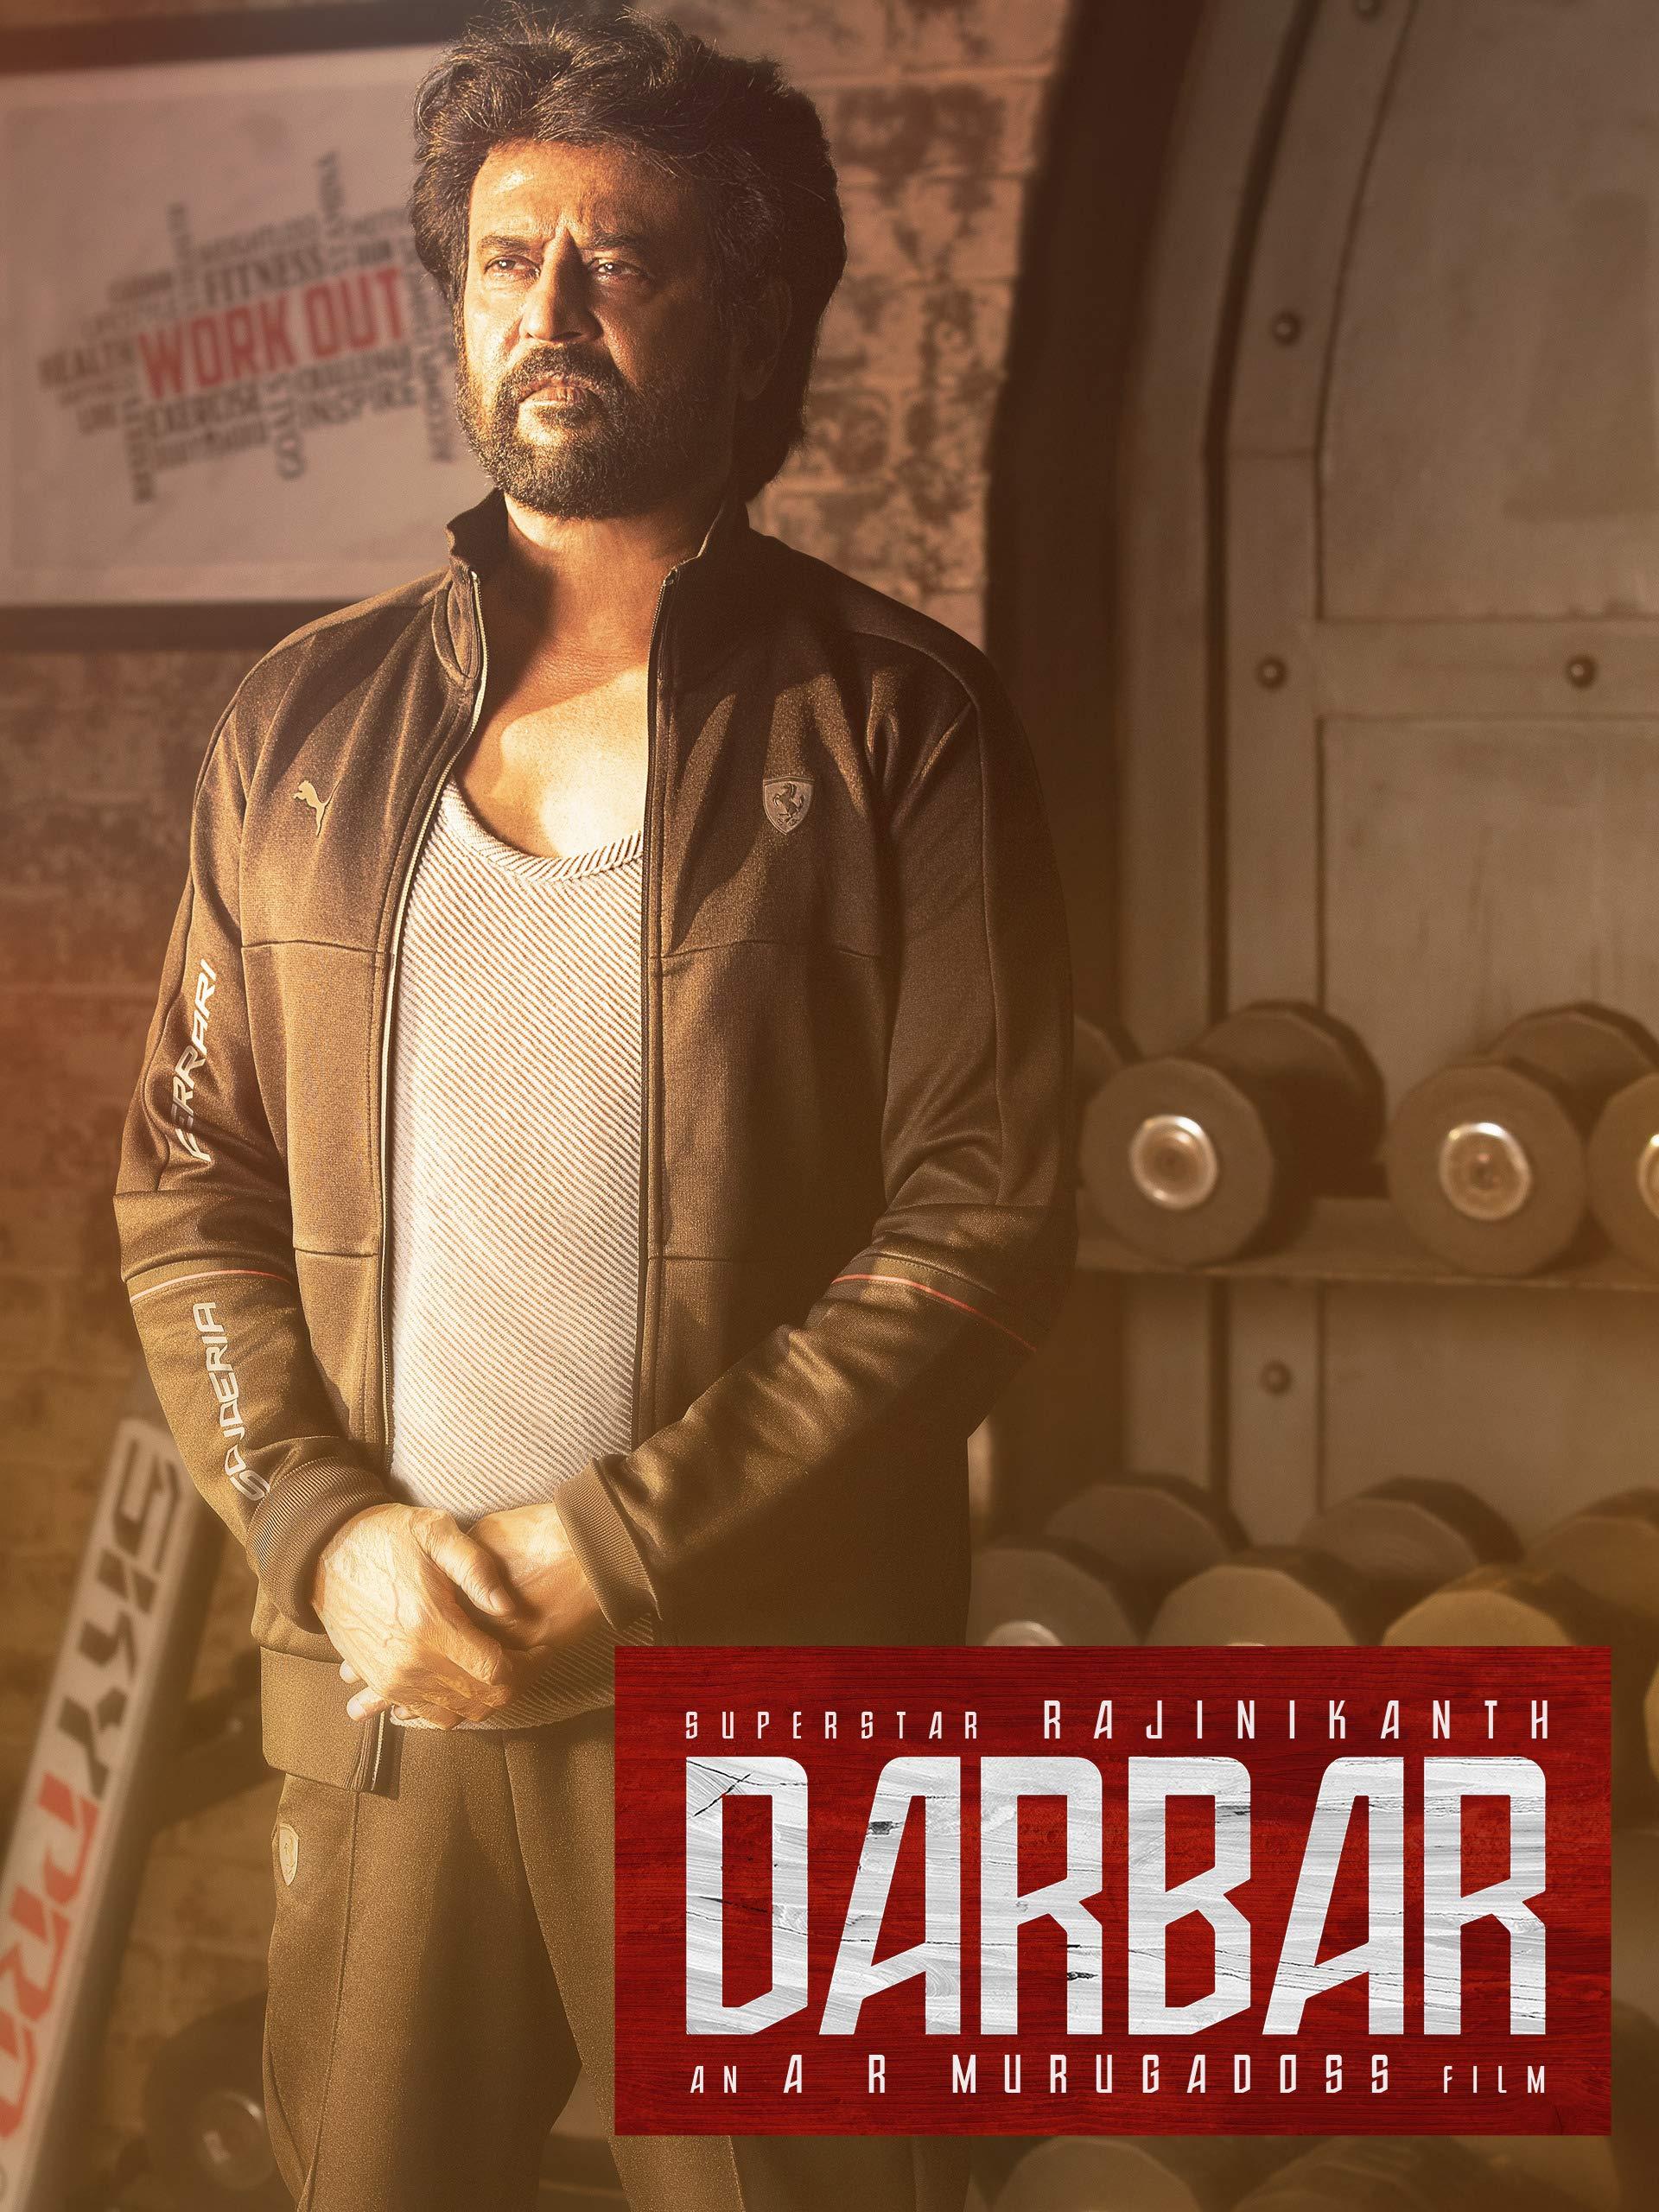 Watch Darbar (Tamil) | Prime Video